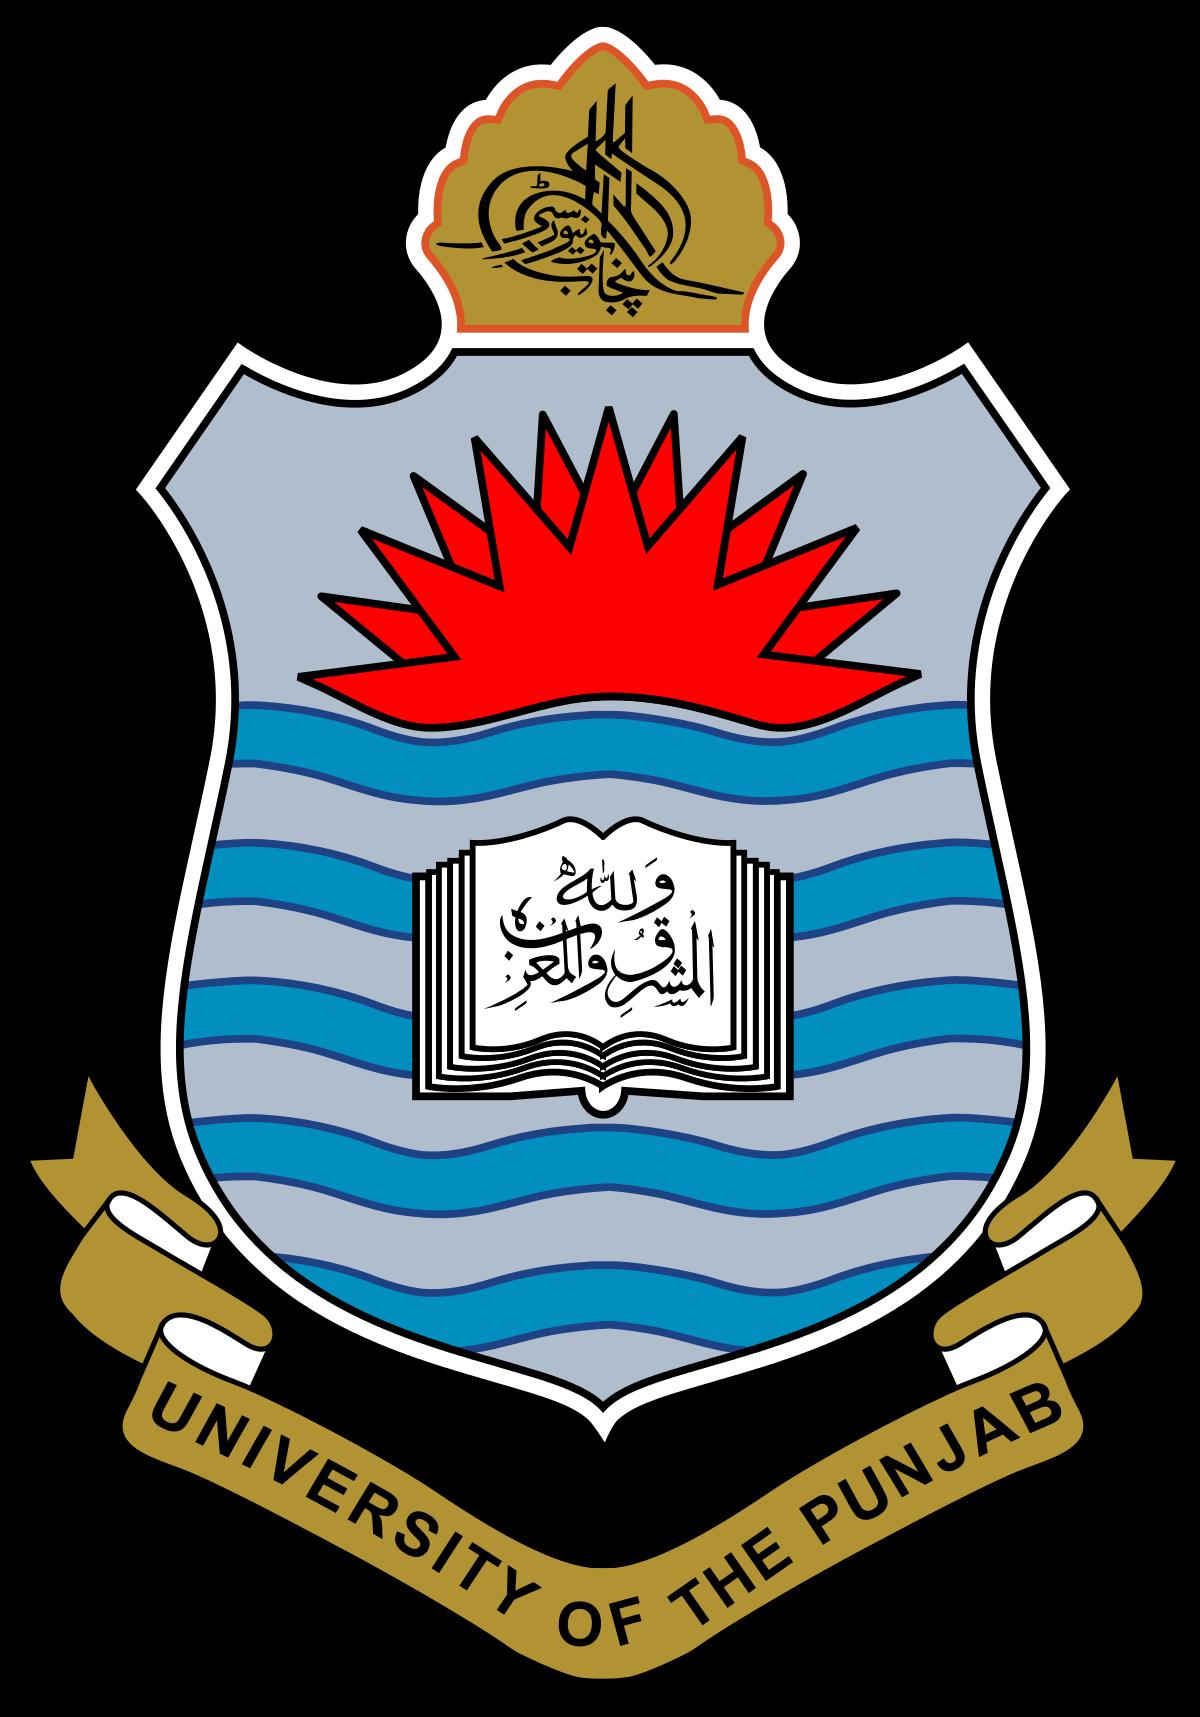 Punjab University Roll Number Slip 2018